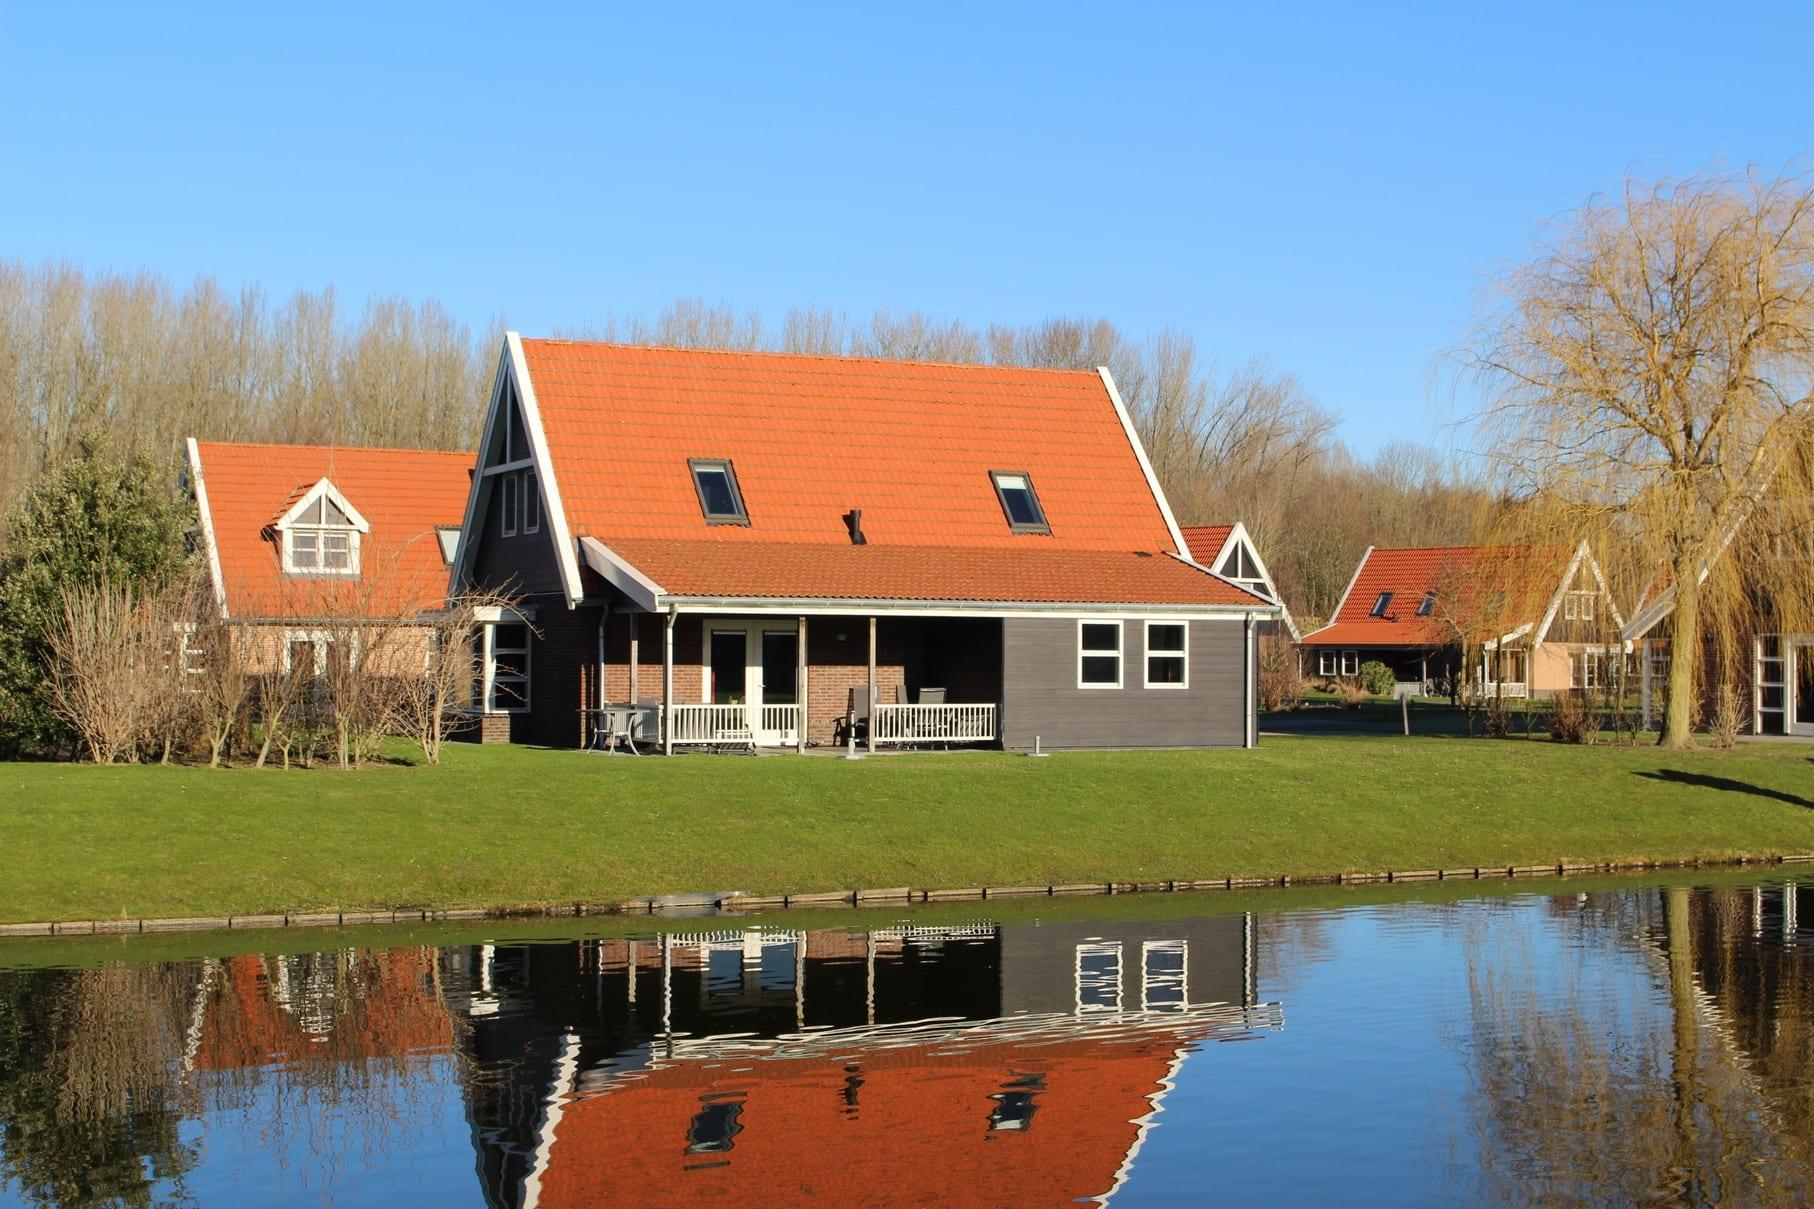 1 Vakantiehuis 1046 Waterparc Veluwemeer 10-pers.